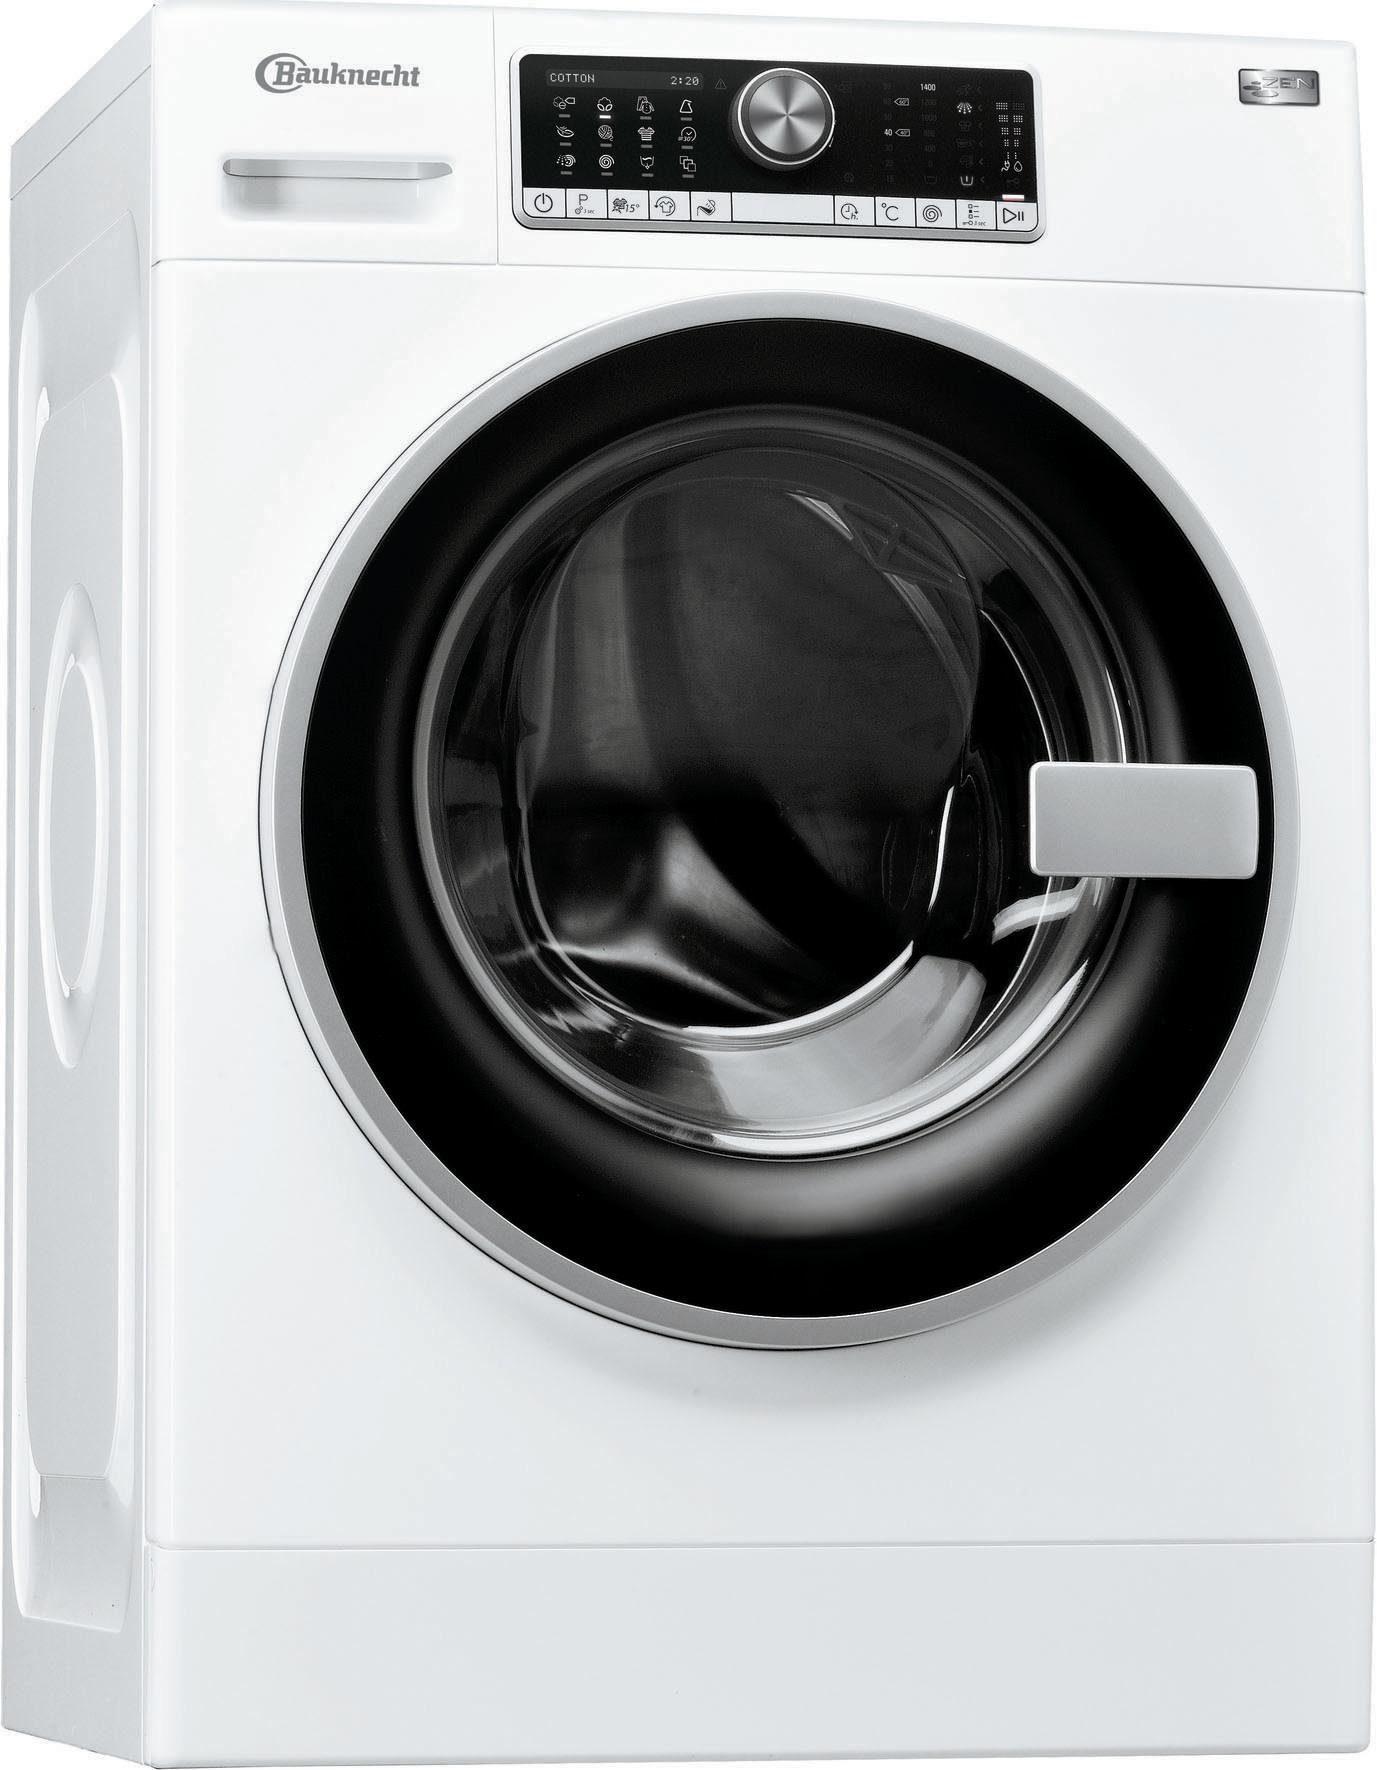 BAUKNECHT Waschmaschine WM Trend924ZEN, 9 kg, 1400 U/Min